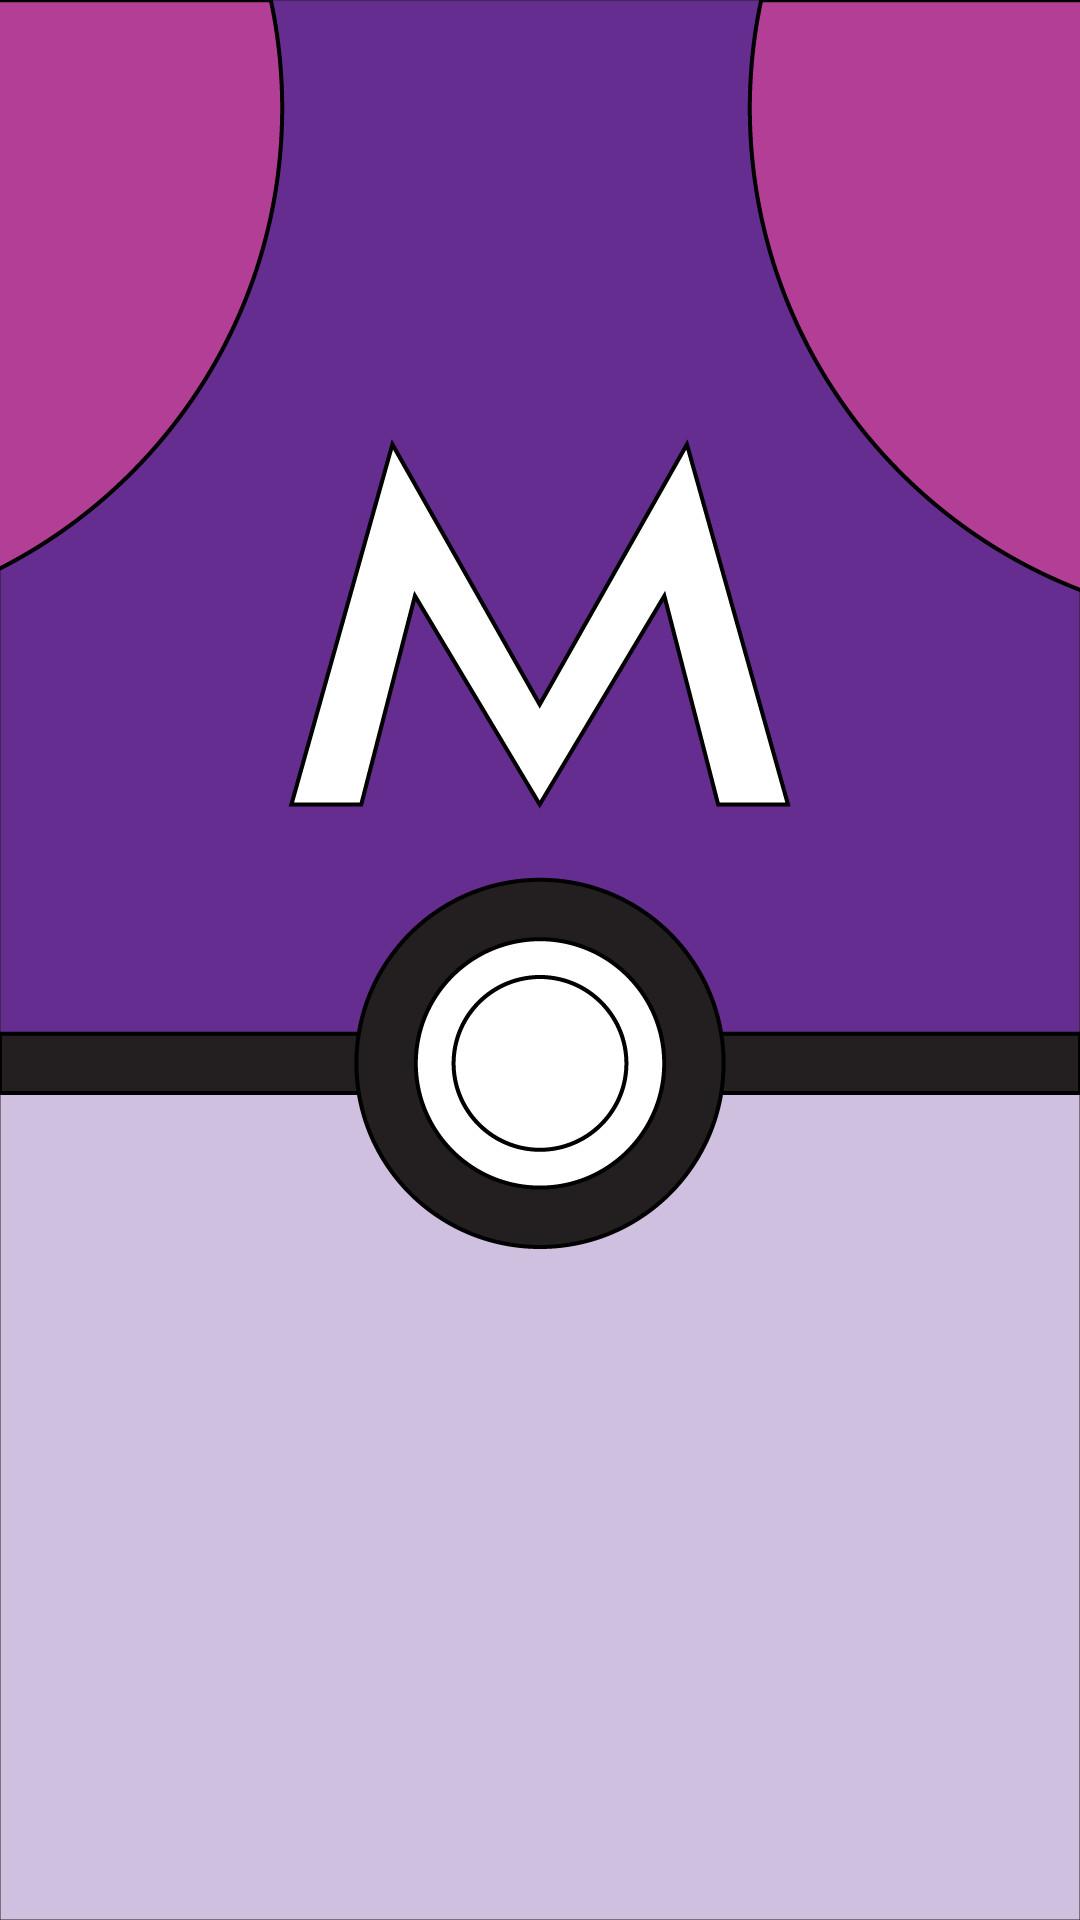 Res: 1080x1920, master ball pokeball pokemon poke ball nintendo minimalist wallpaper